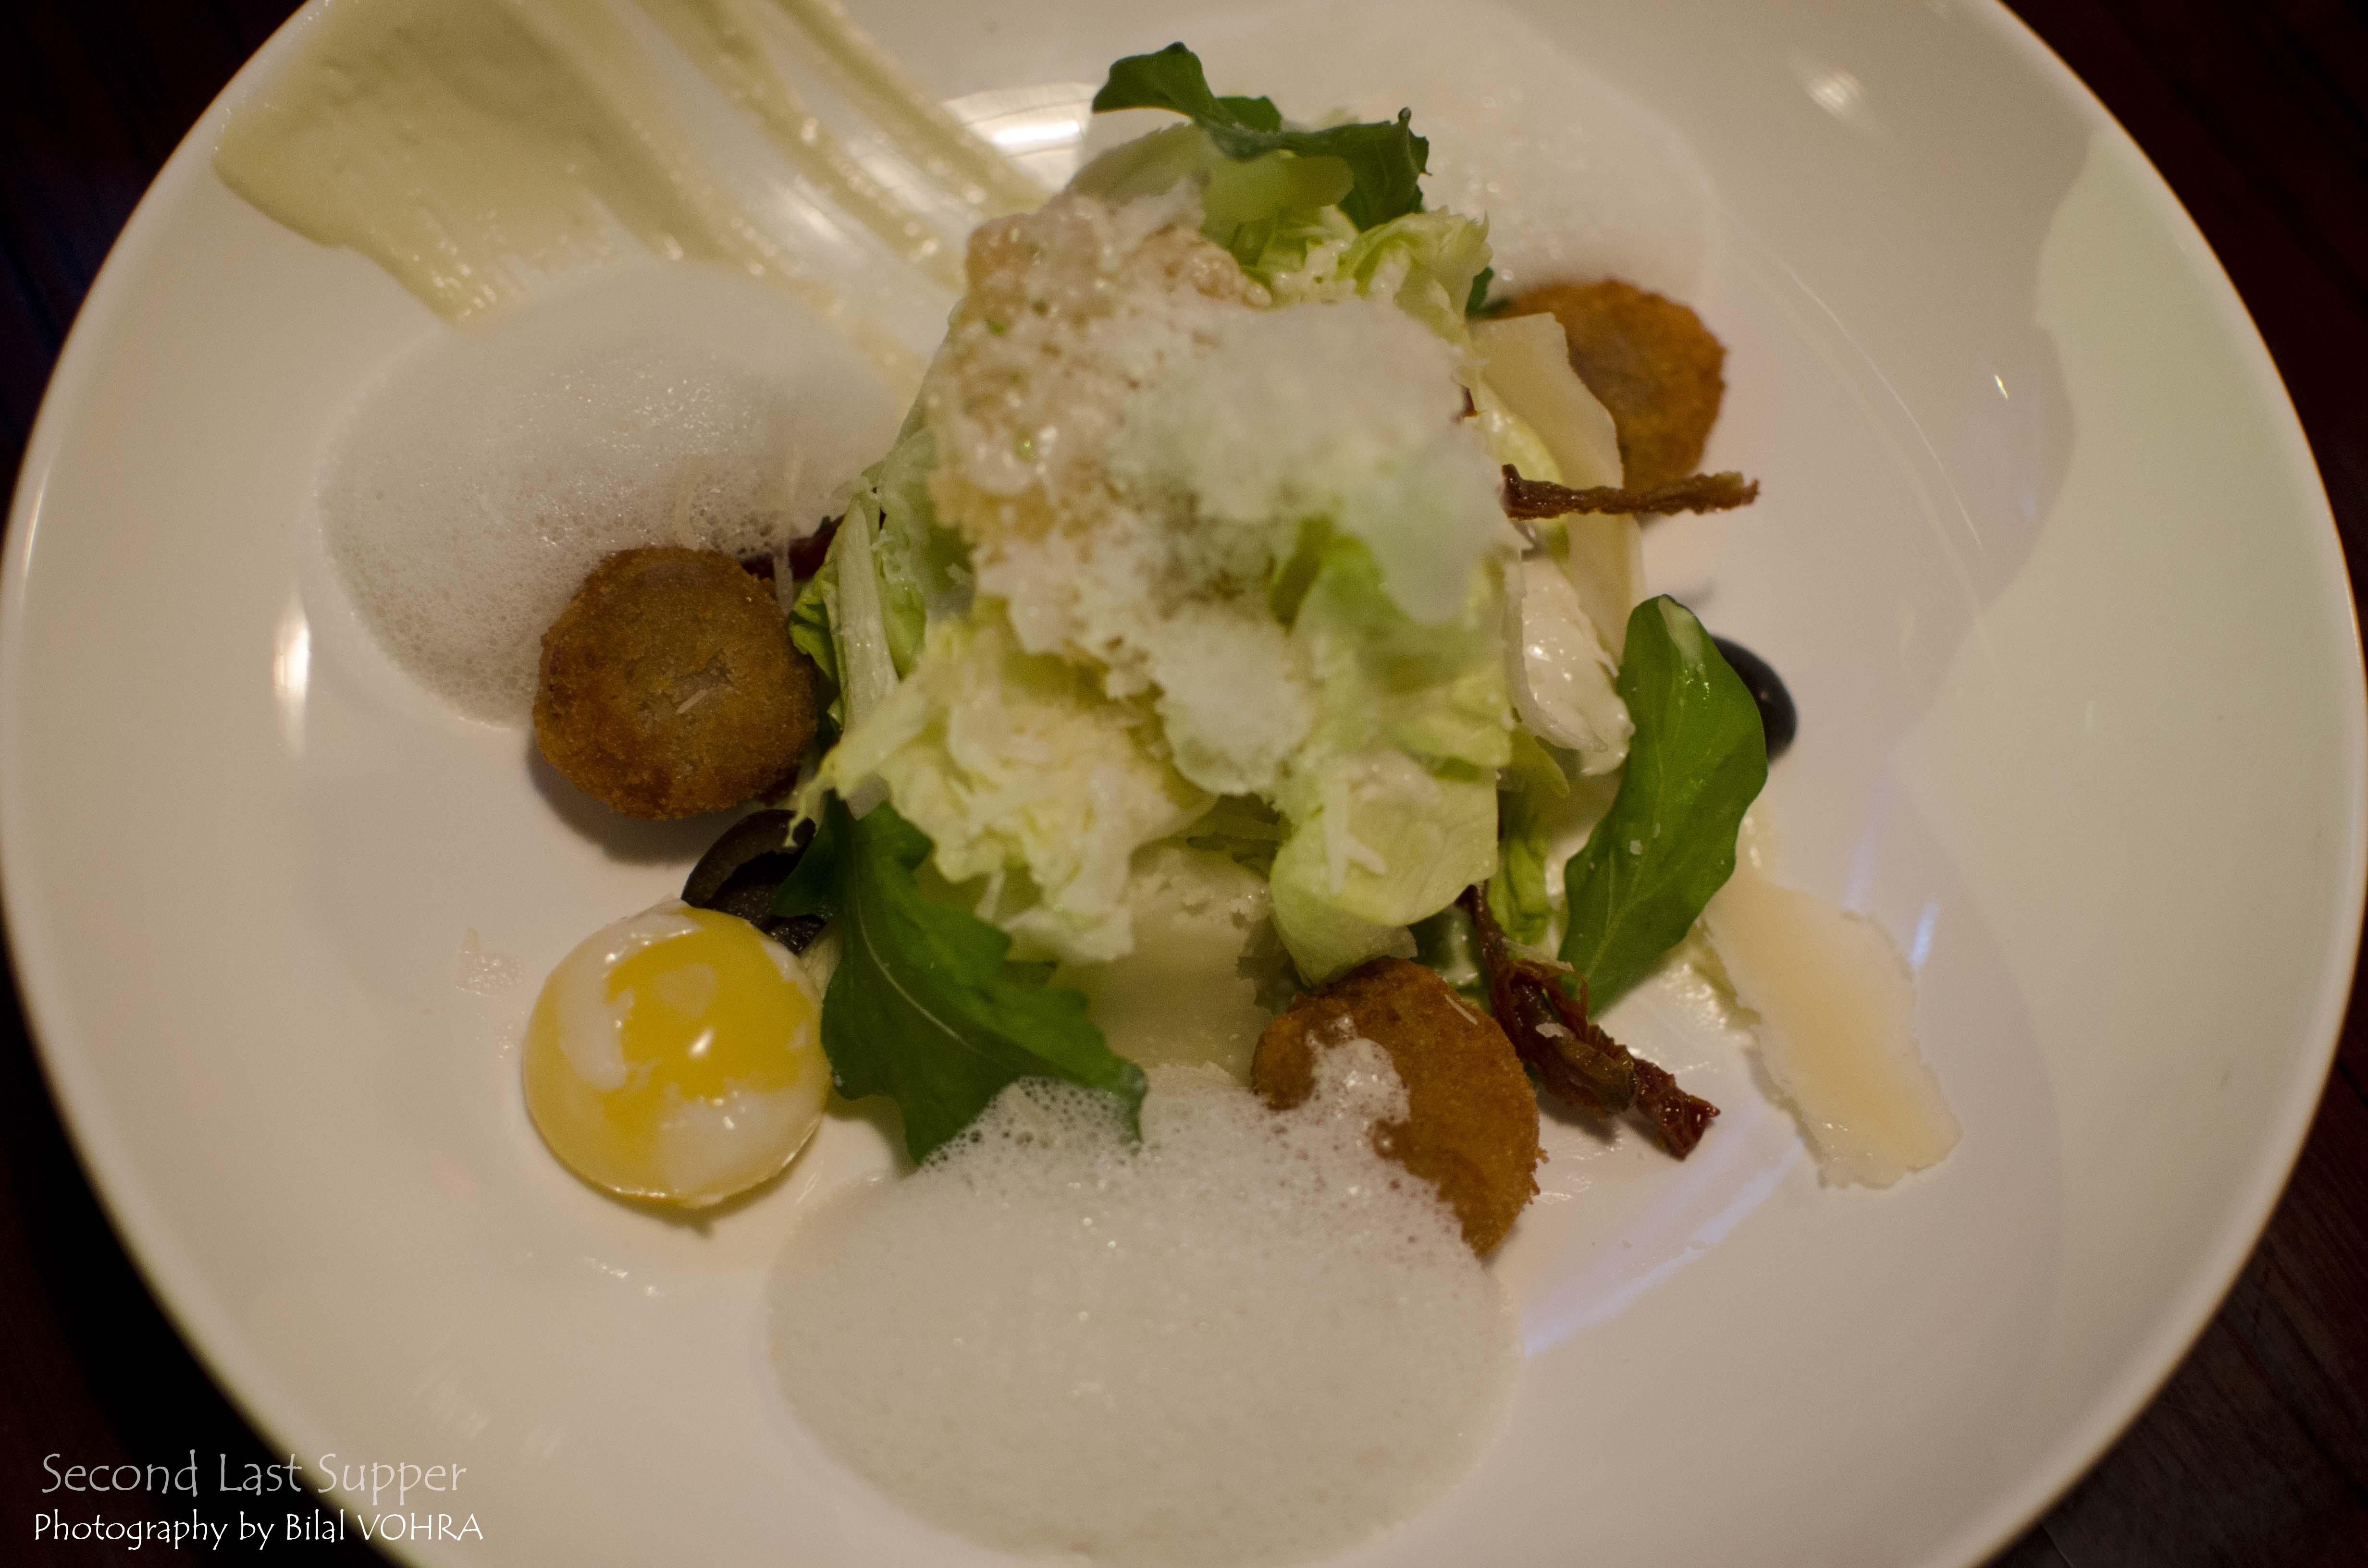 New Age Ceaser Salad